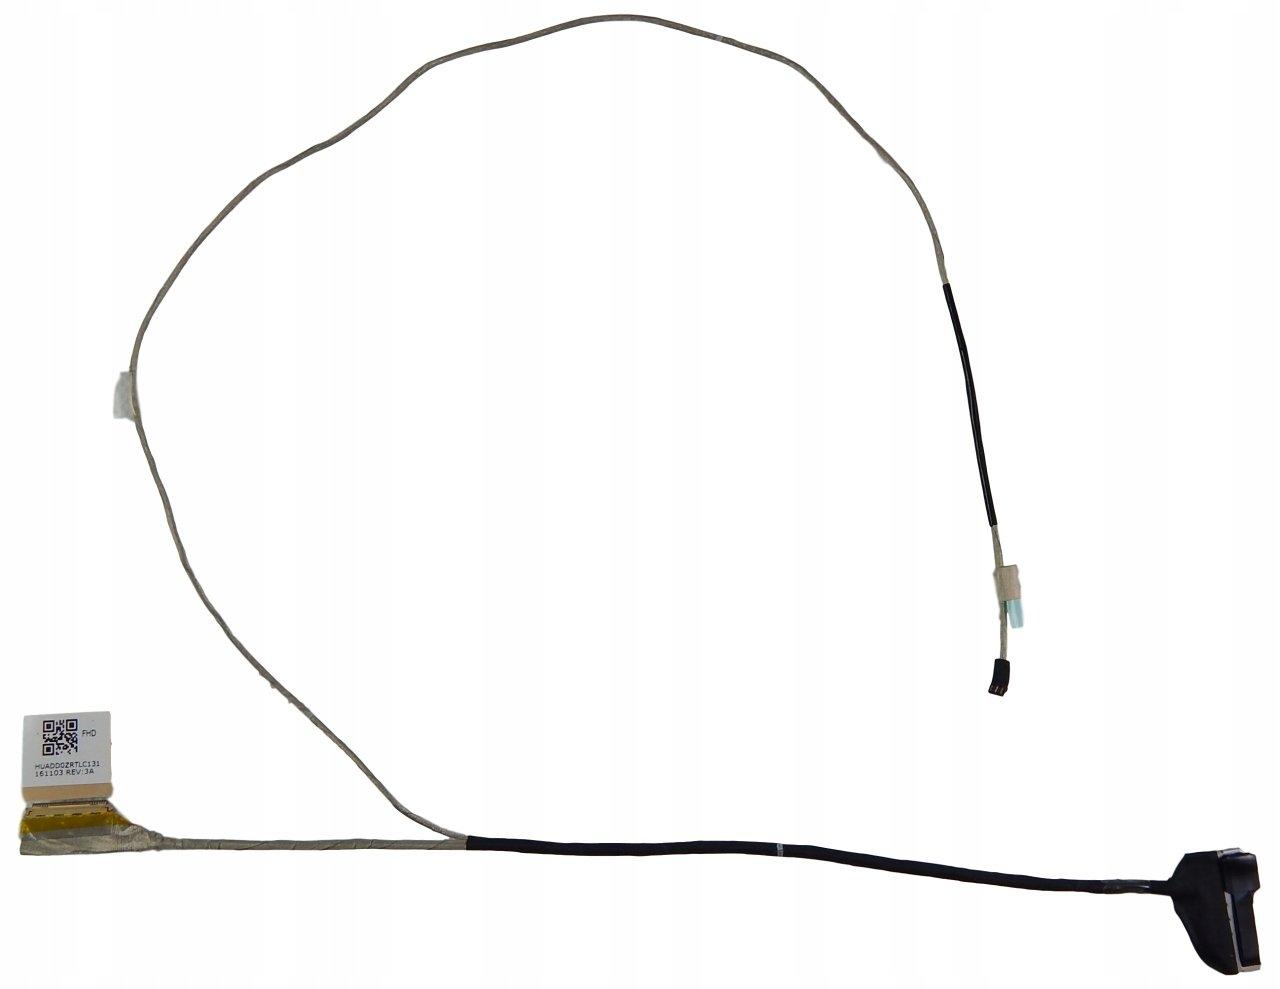 Acer Aspire E5-574TG, F5-571G, F5-571T, F5-571TG. LCD Flex